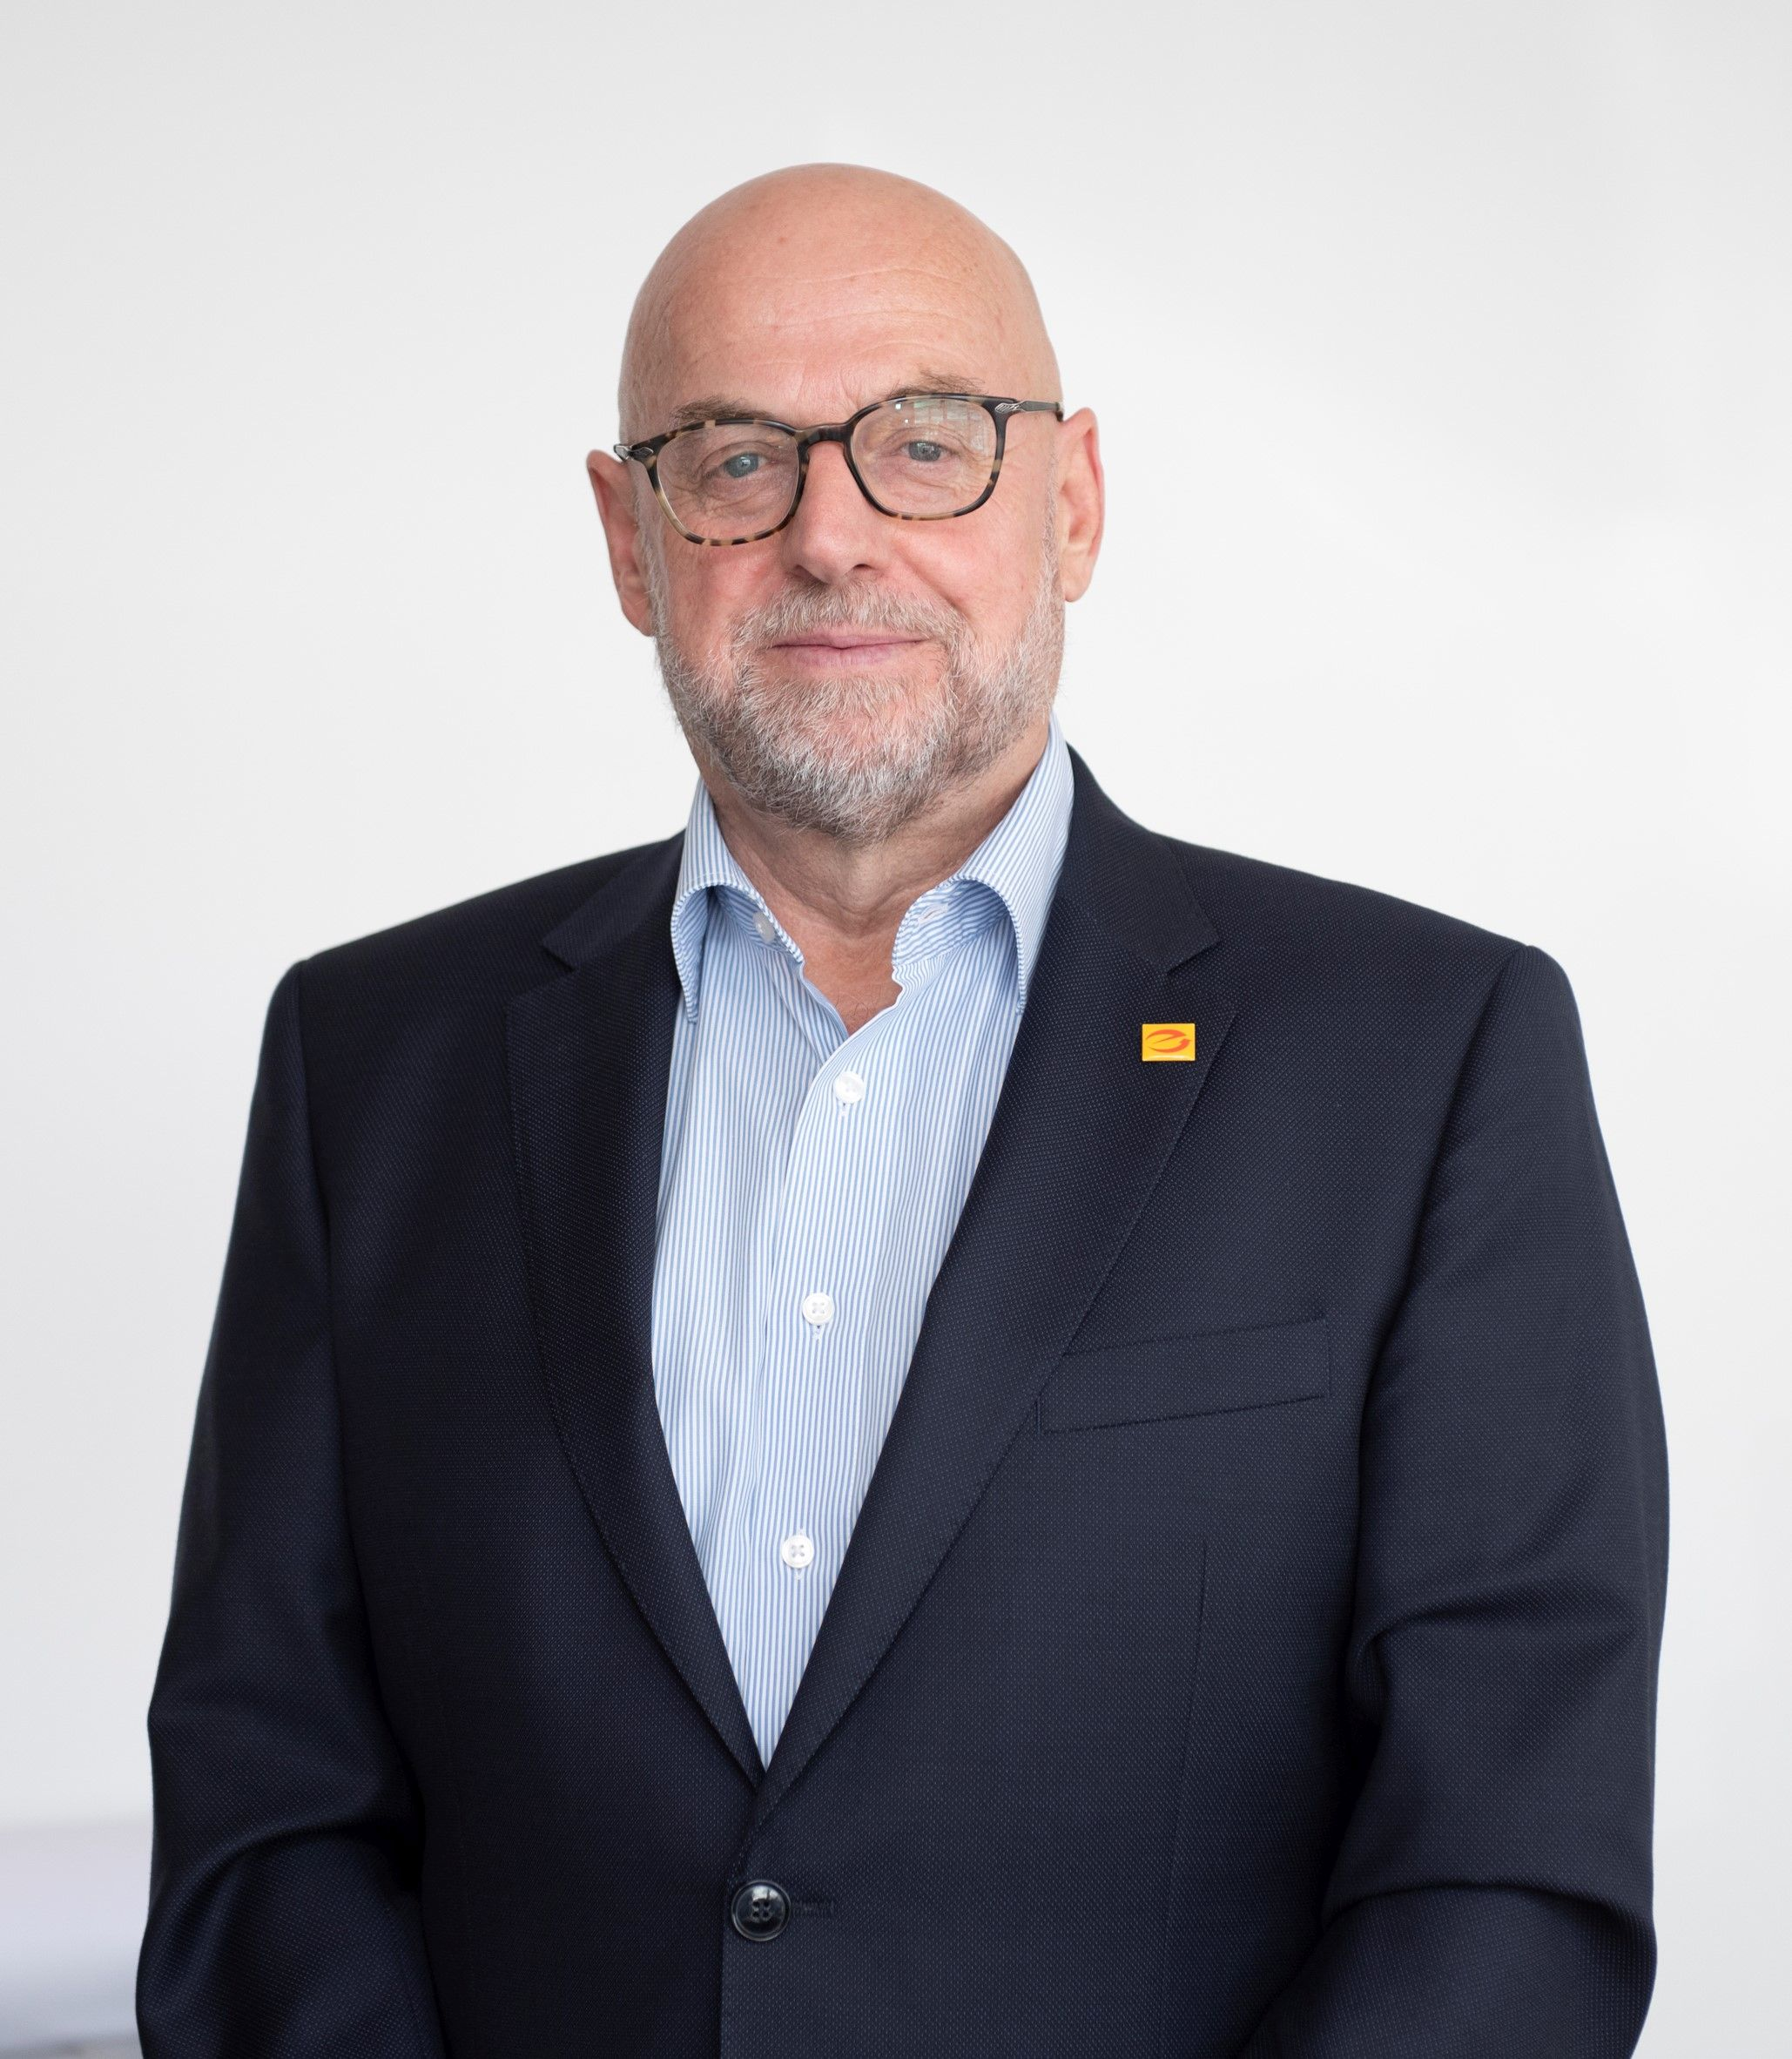 Günter Bartruff